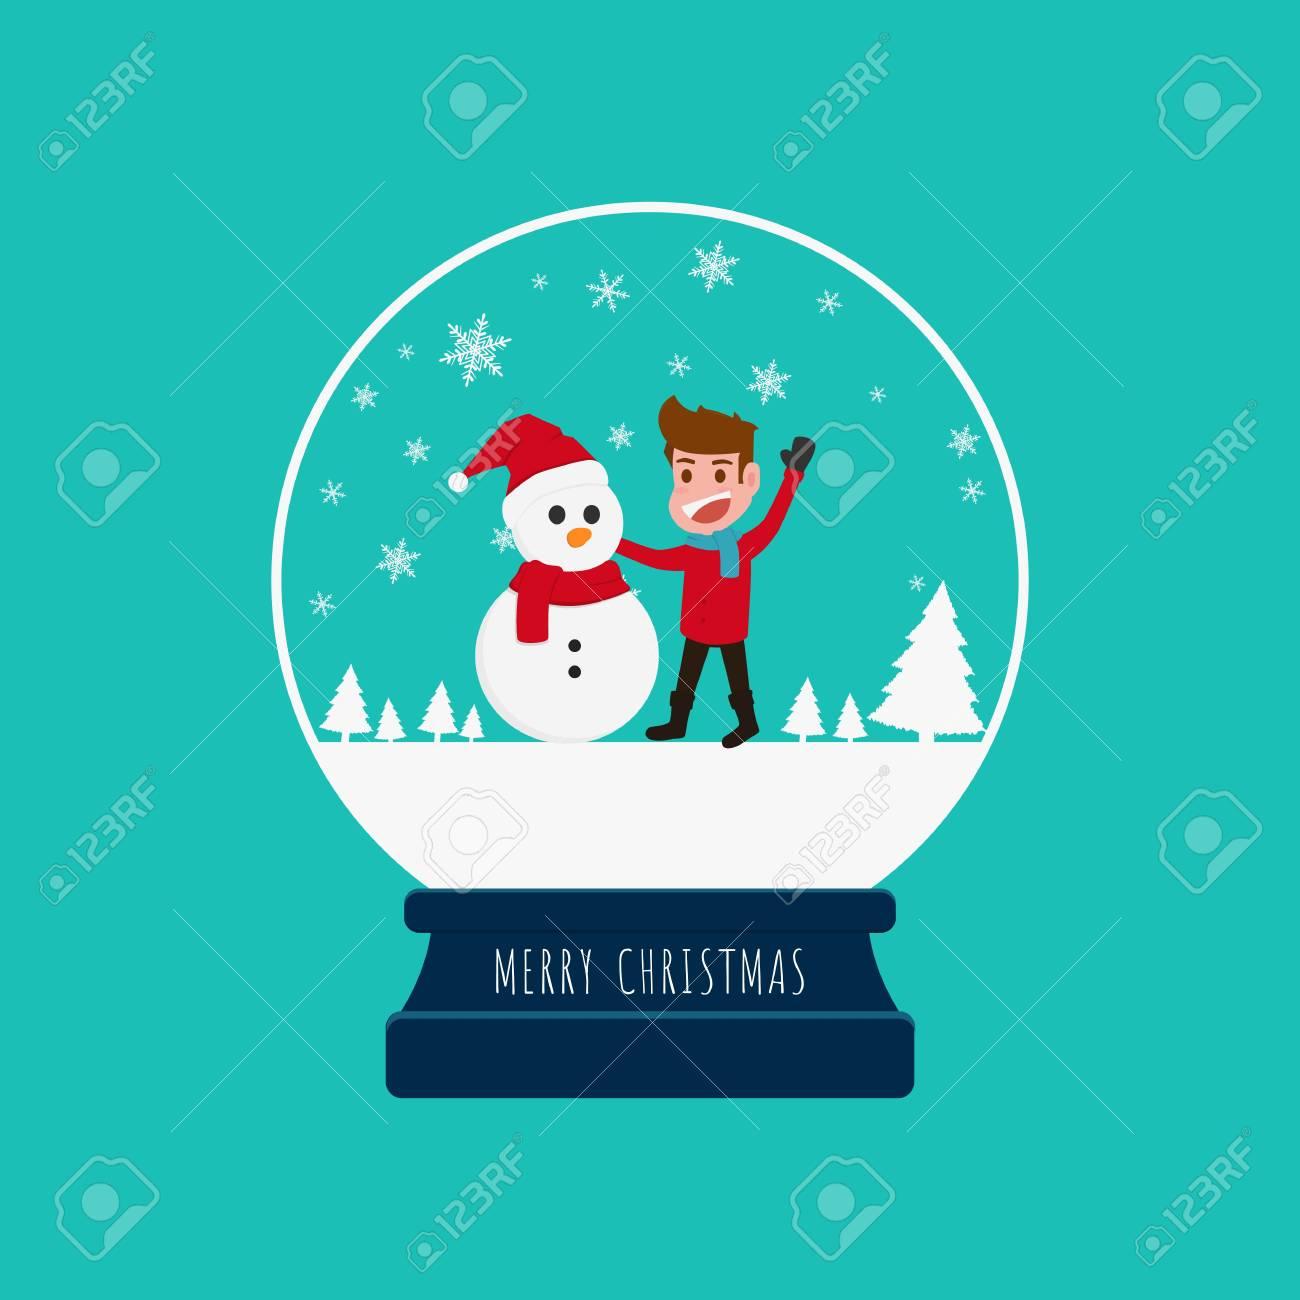 Merry Christmas Snow Globe With A Boy And Snowman Cartoon Vector Illustration Stock Vector